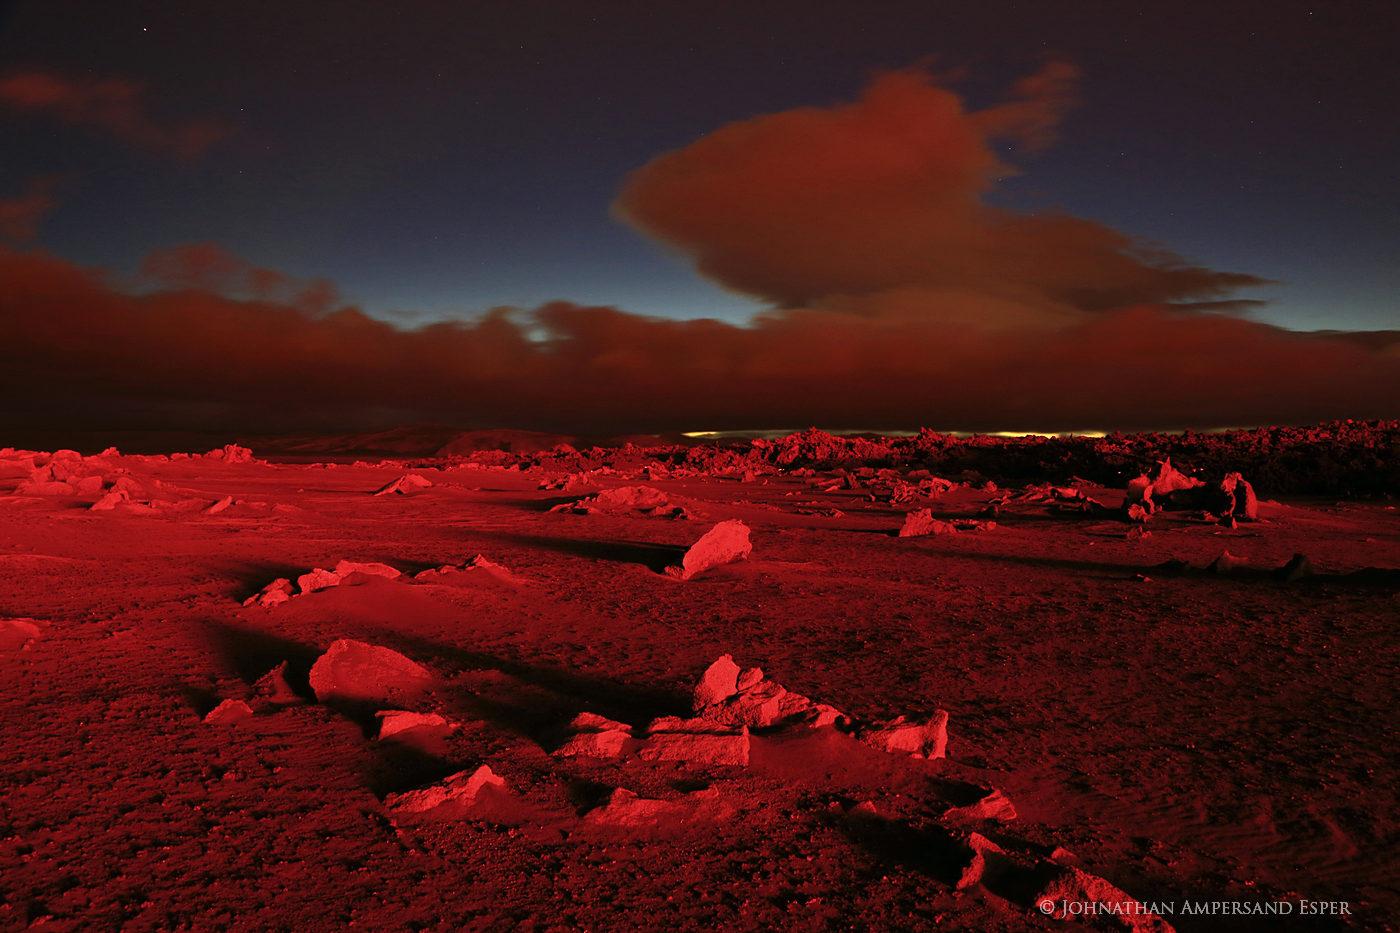 2014, Baugur, Bárðarbunga, Holuhraun, Iceland, Mars, crater, erupting, eruption, flow, glow, lava, red, red glow, sky, photo